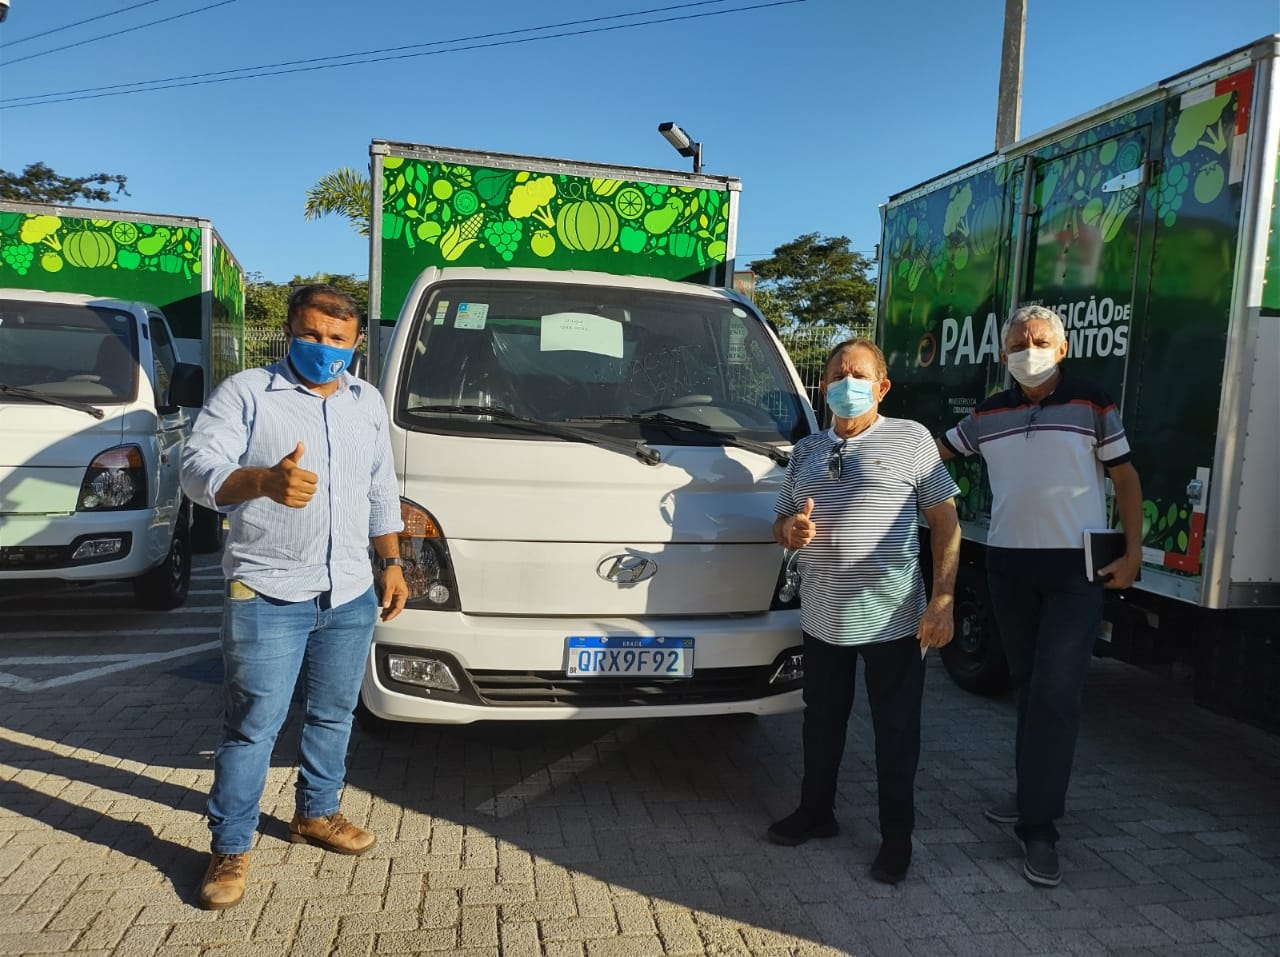 Dr. Wagner leva projetos para Sen. Ciro e recebe veículo para agricultura  - Imagem 1